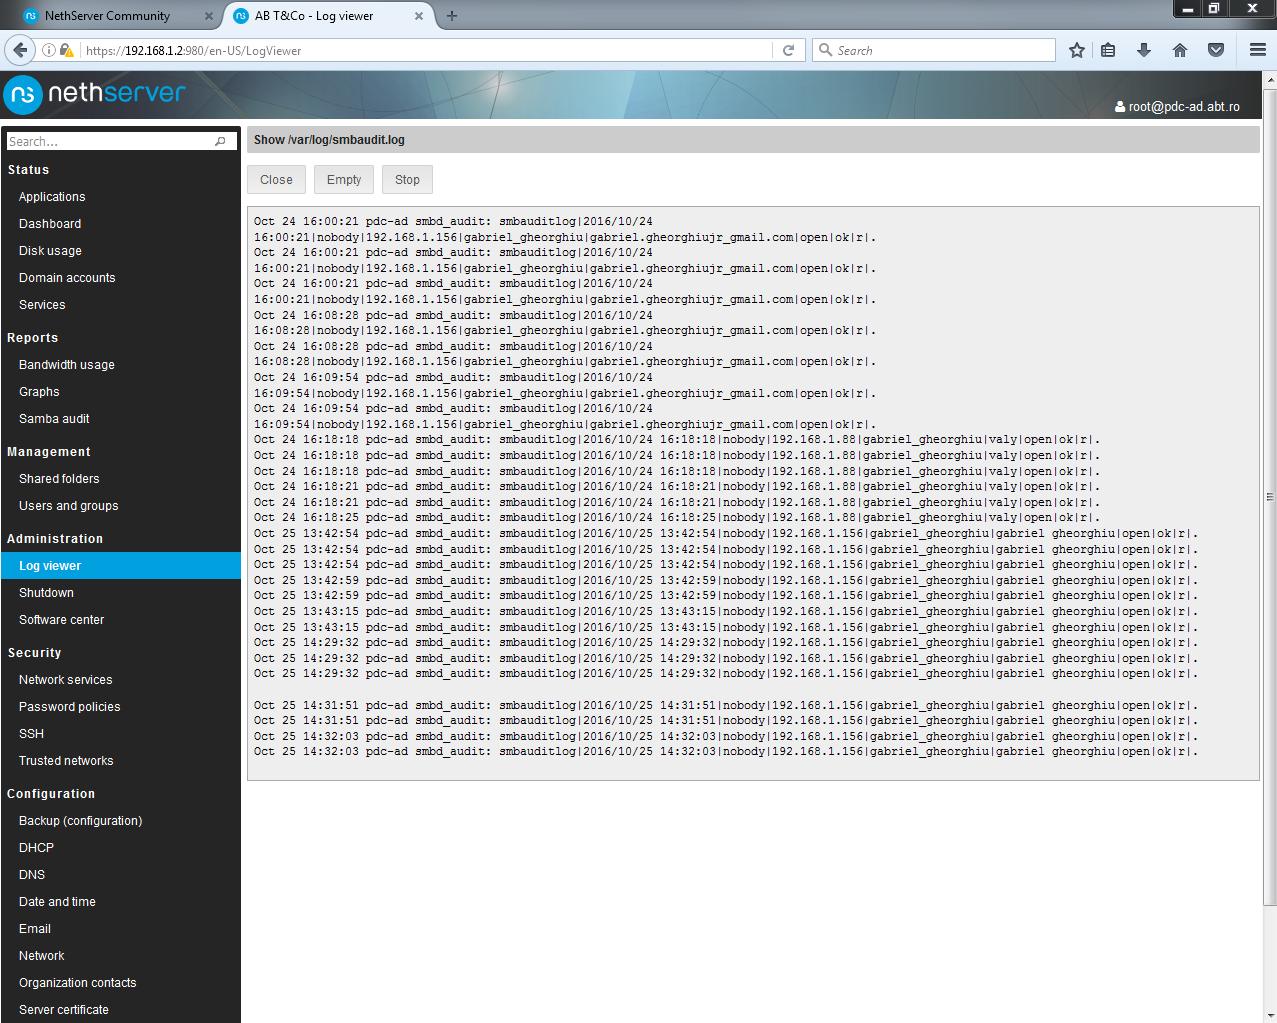 Reports -> Samba audit: no records - Bug - NethServer Community